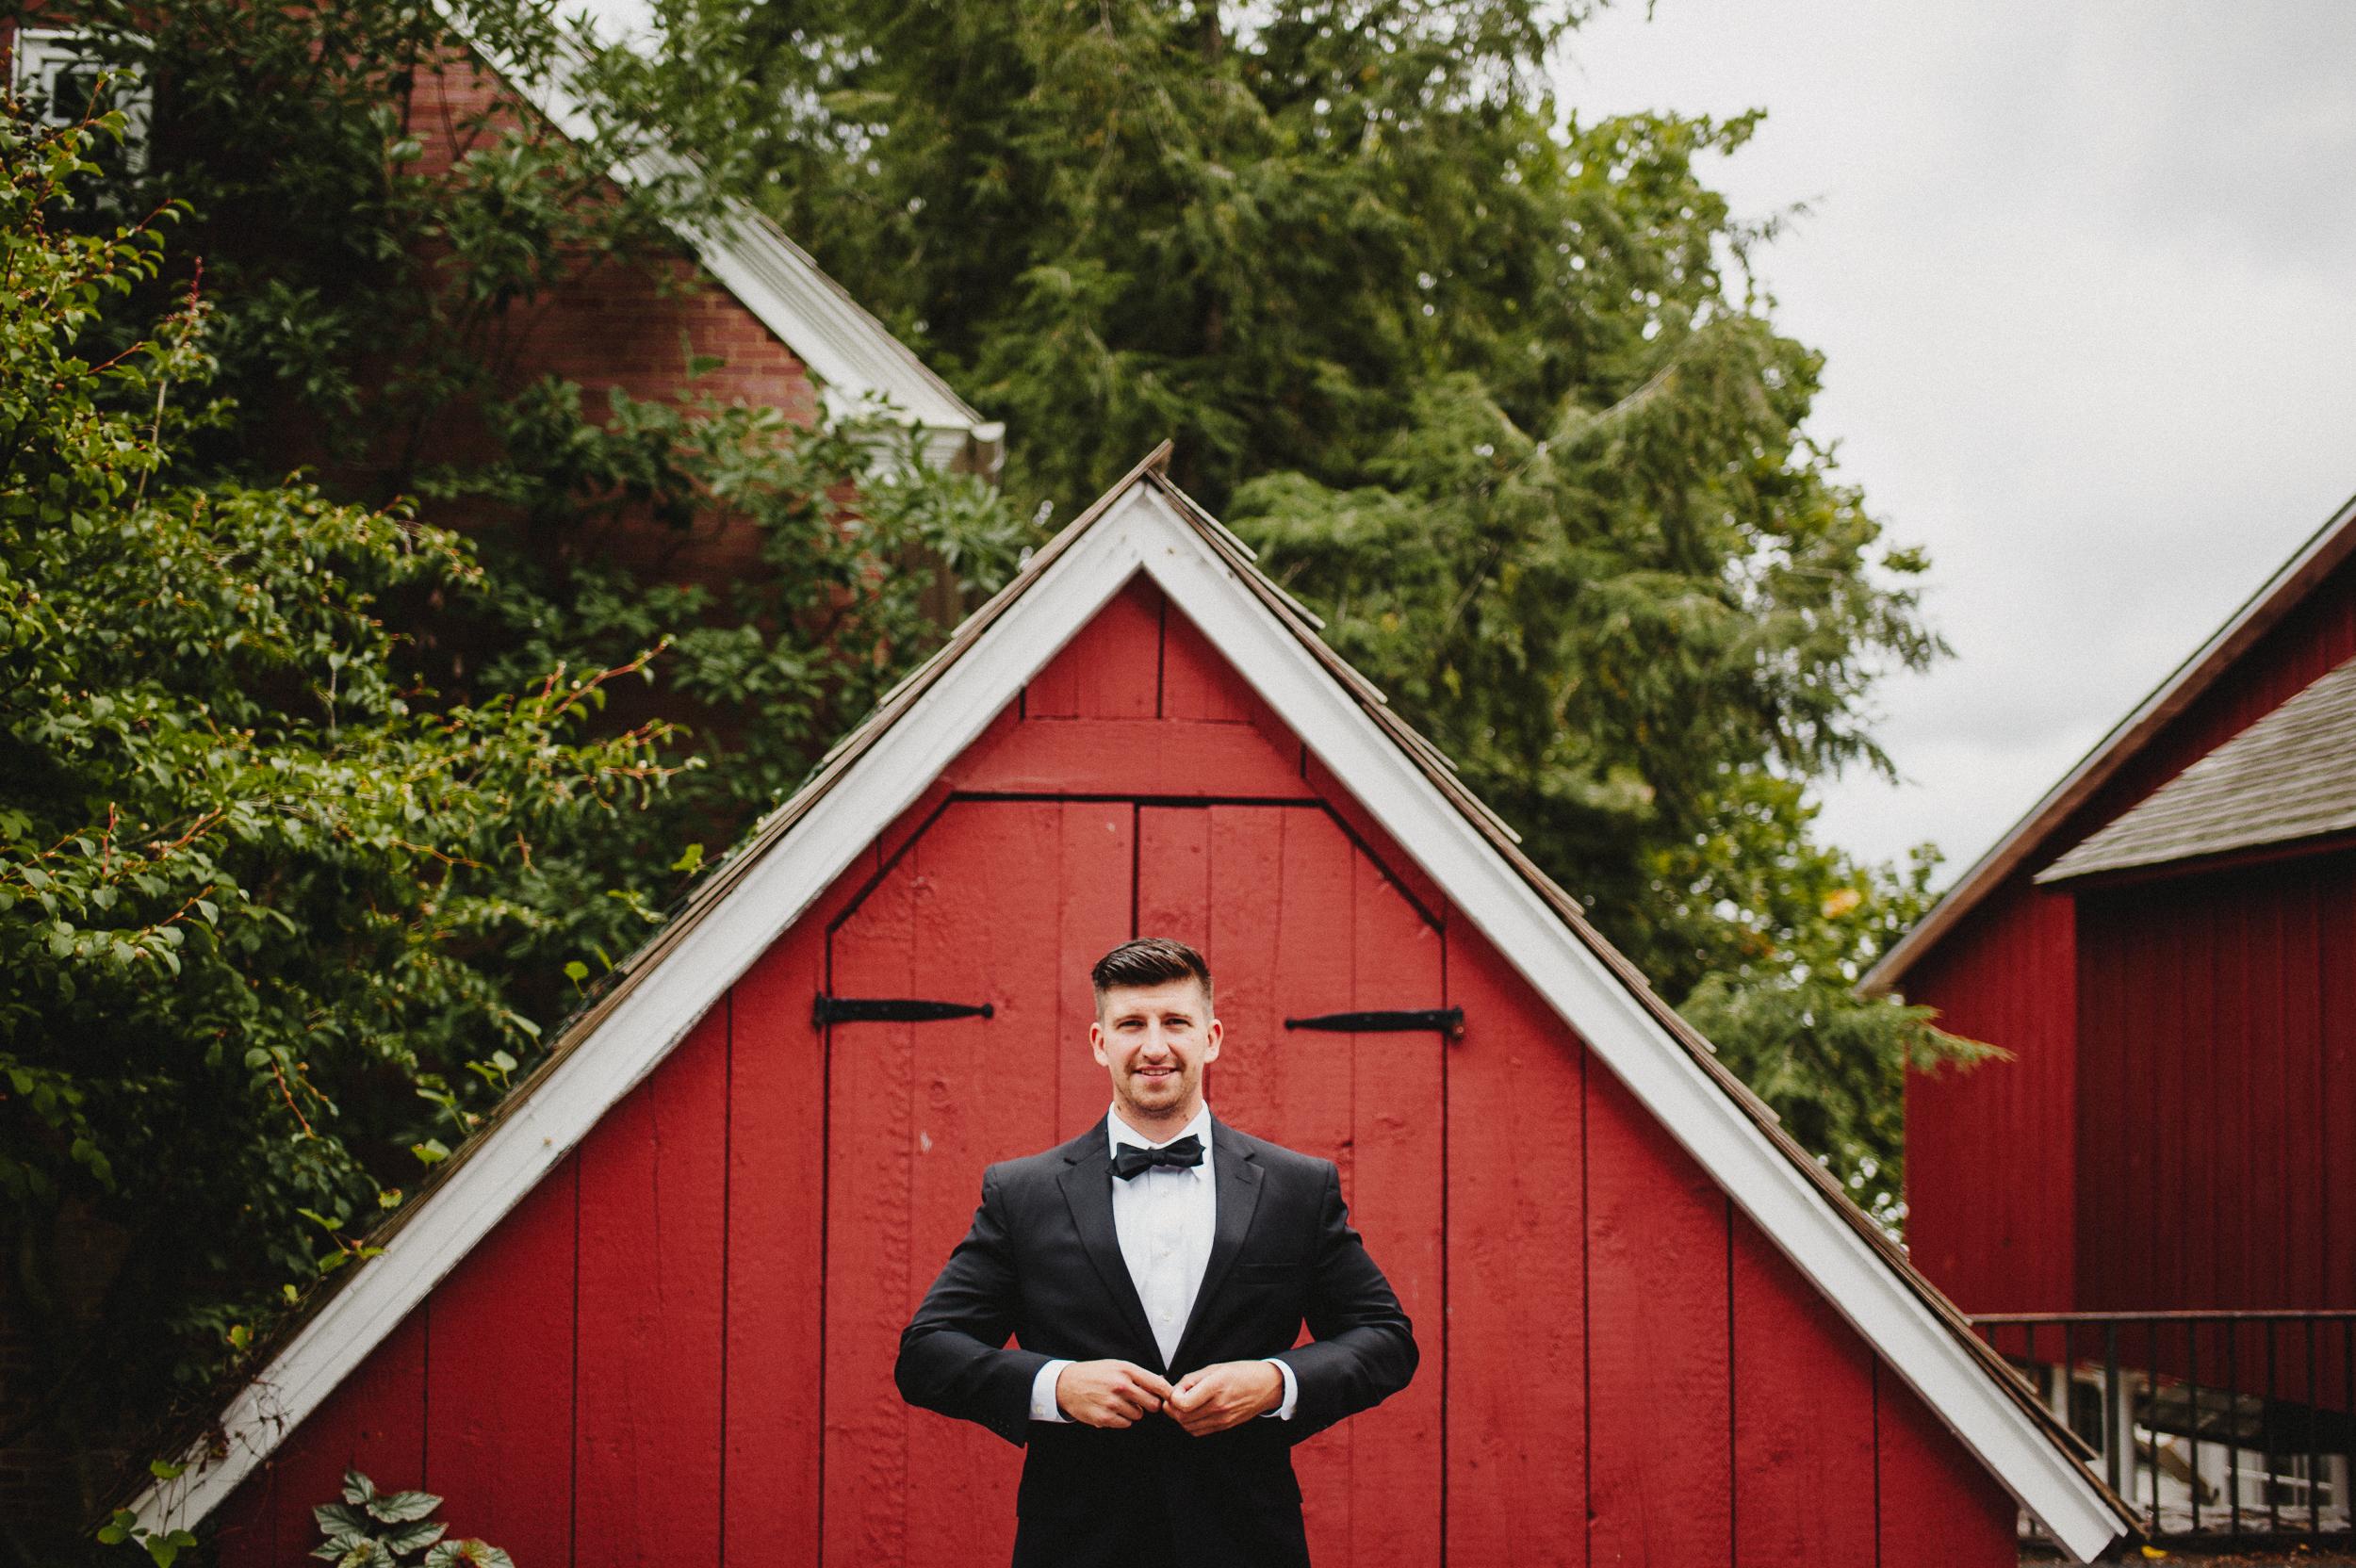 delaware-estate-wedding-photographer-pat-robinson-photography-27.jpg